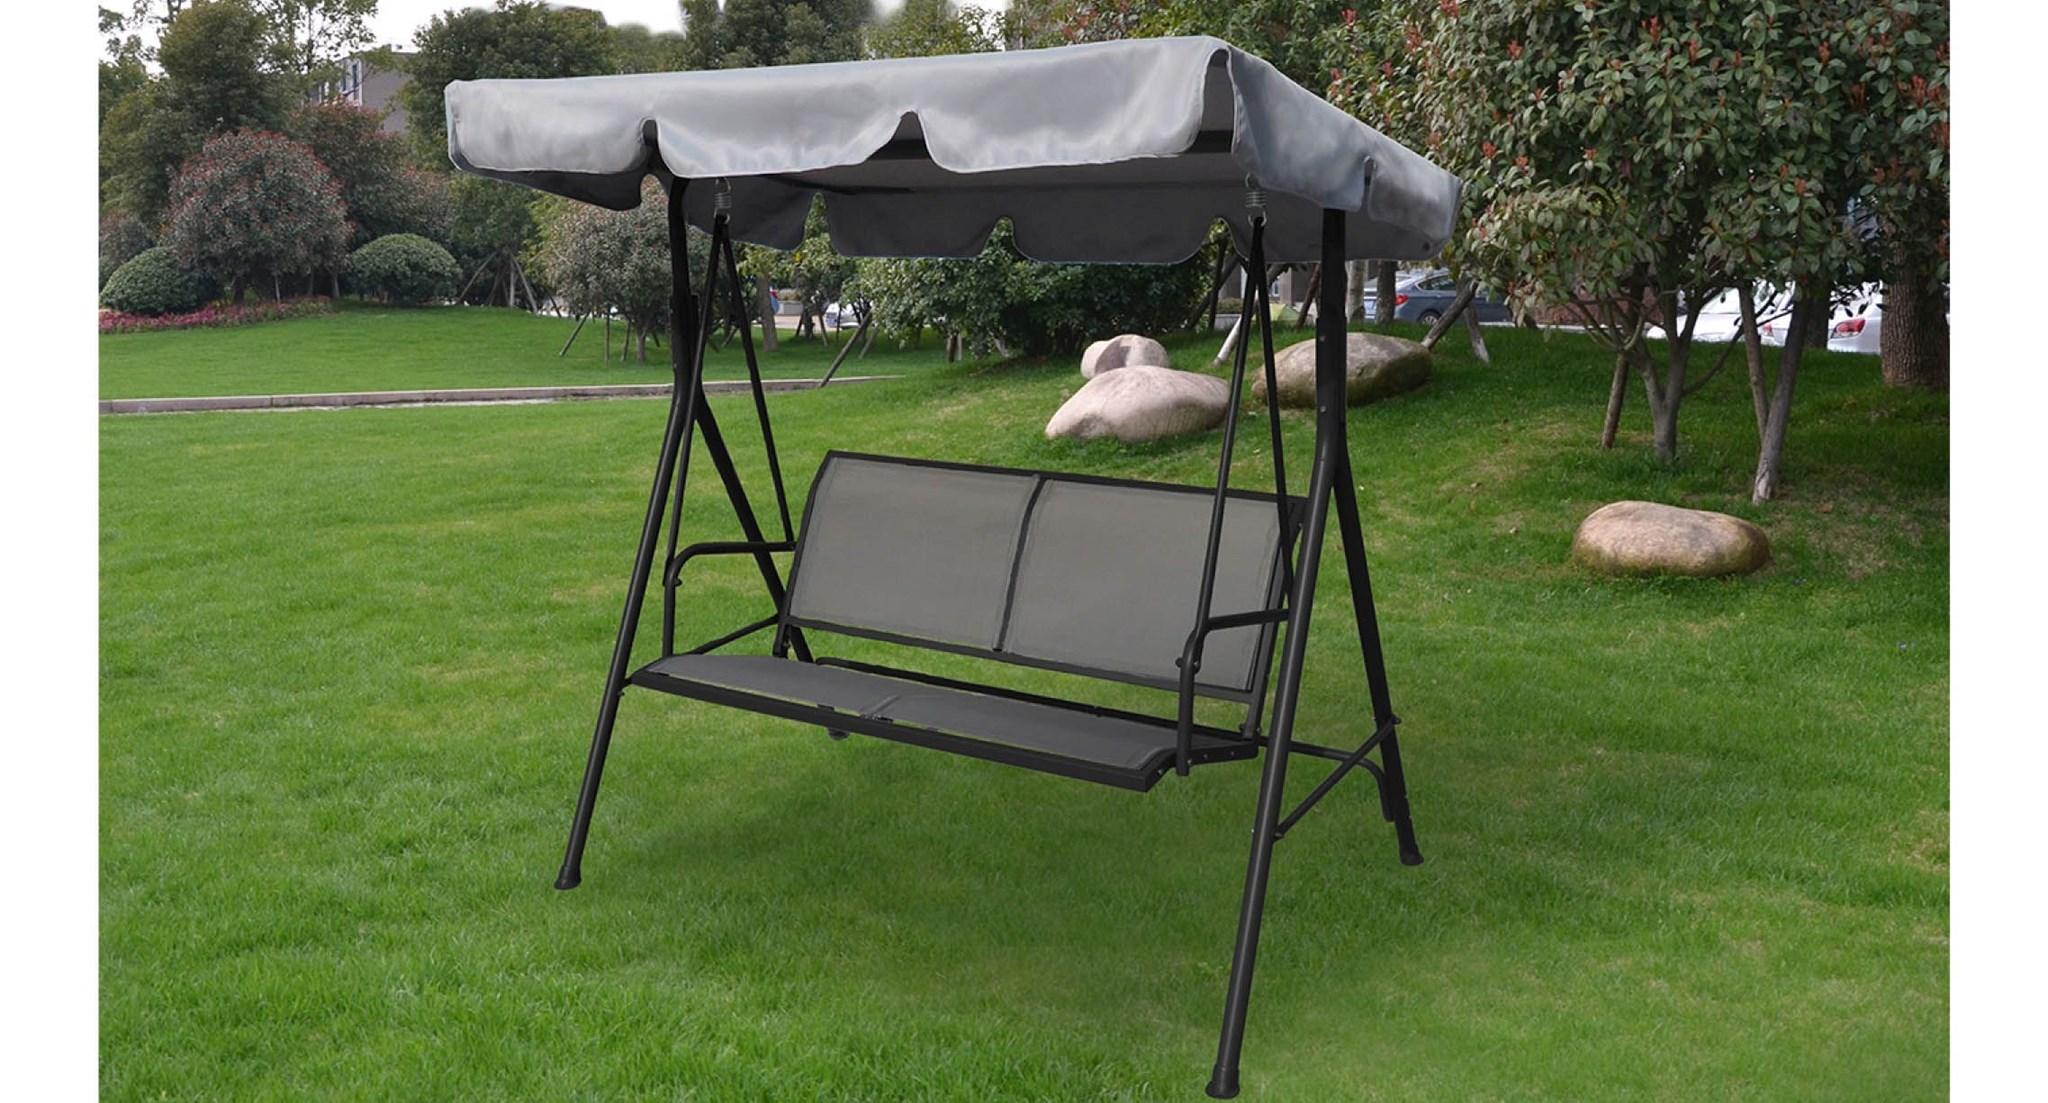 Outdoor Furniture Mobilier De Jardin - Marimac Group